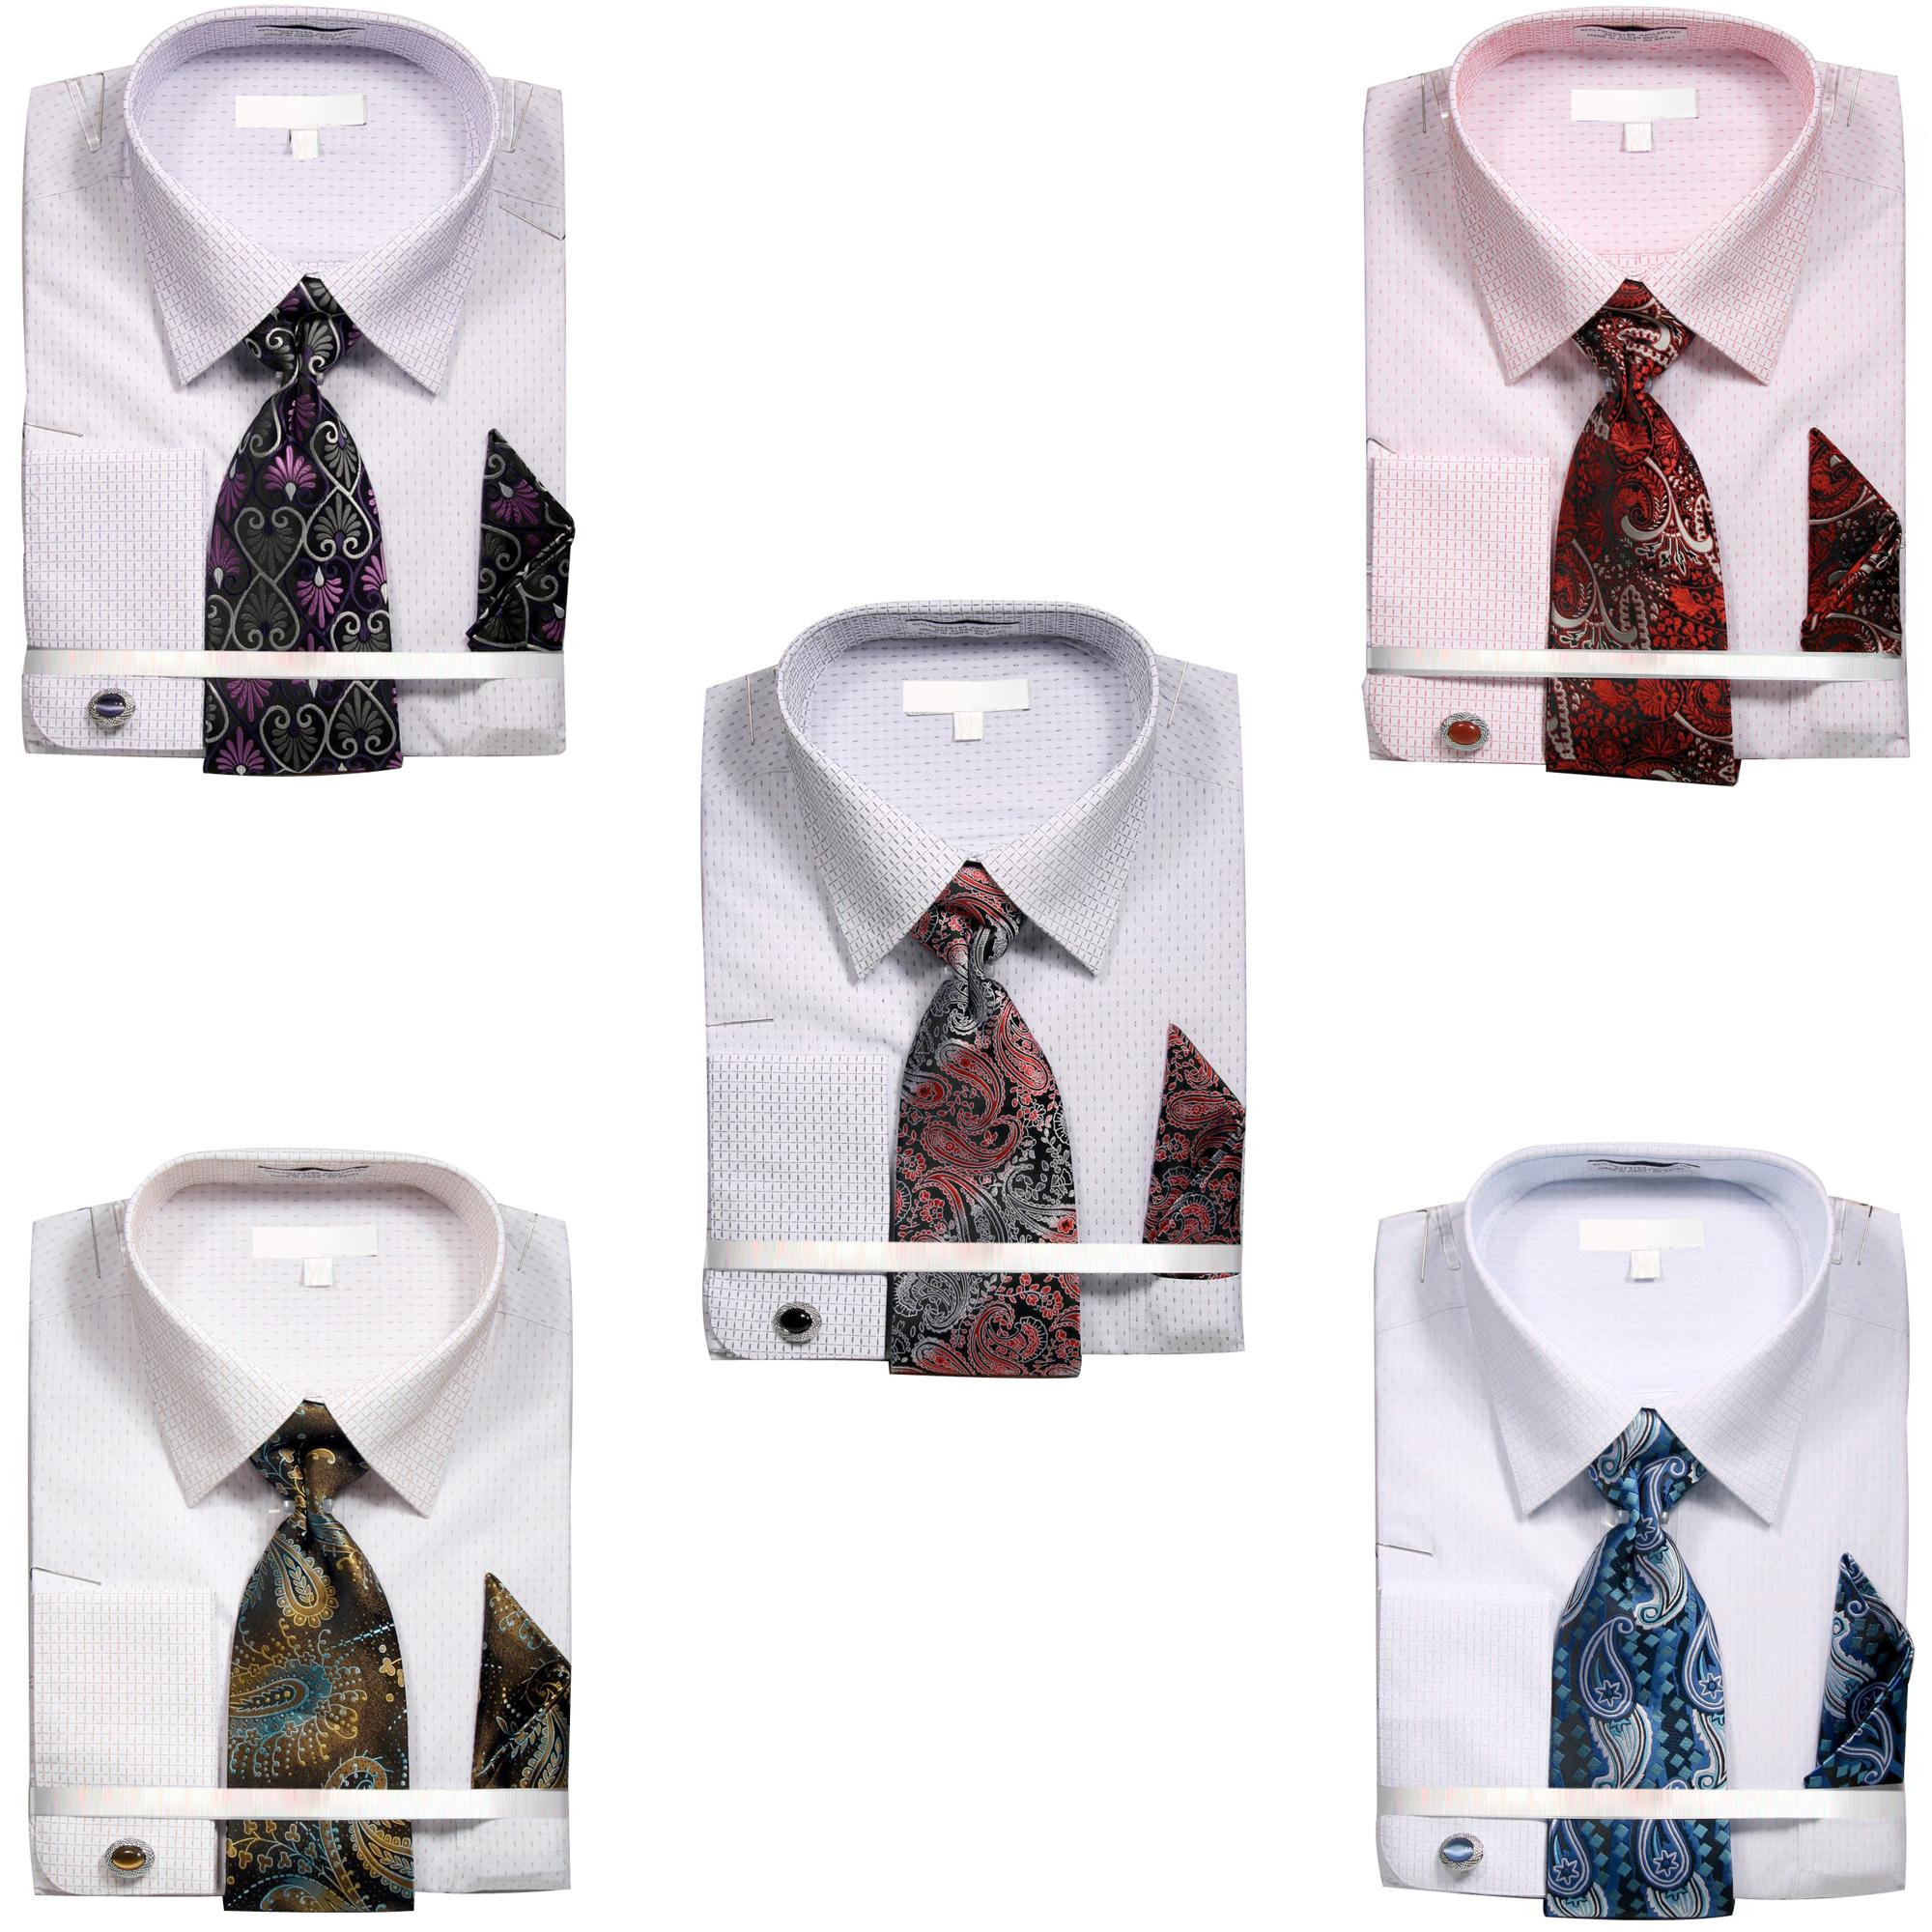 Handkerchief and Cufflinks Men/'s Fashion French Cuff Dress Shirt with Tie